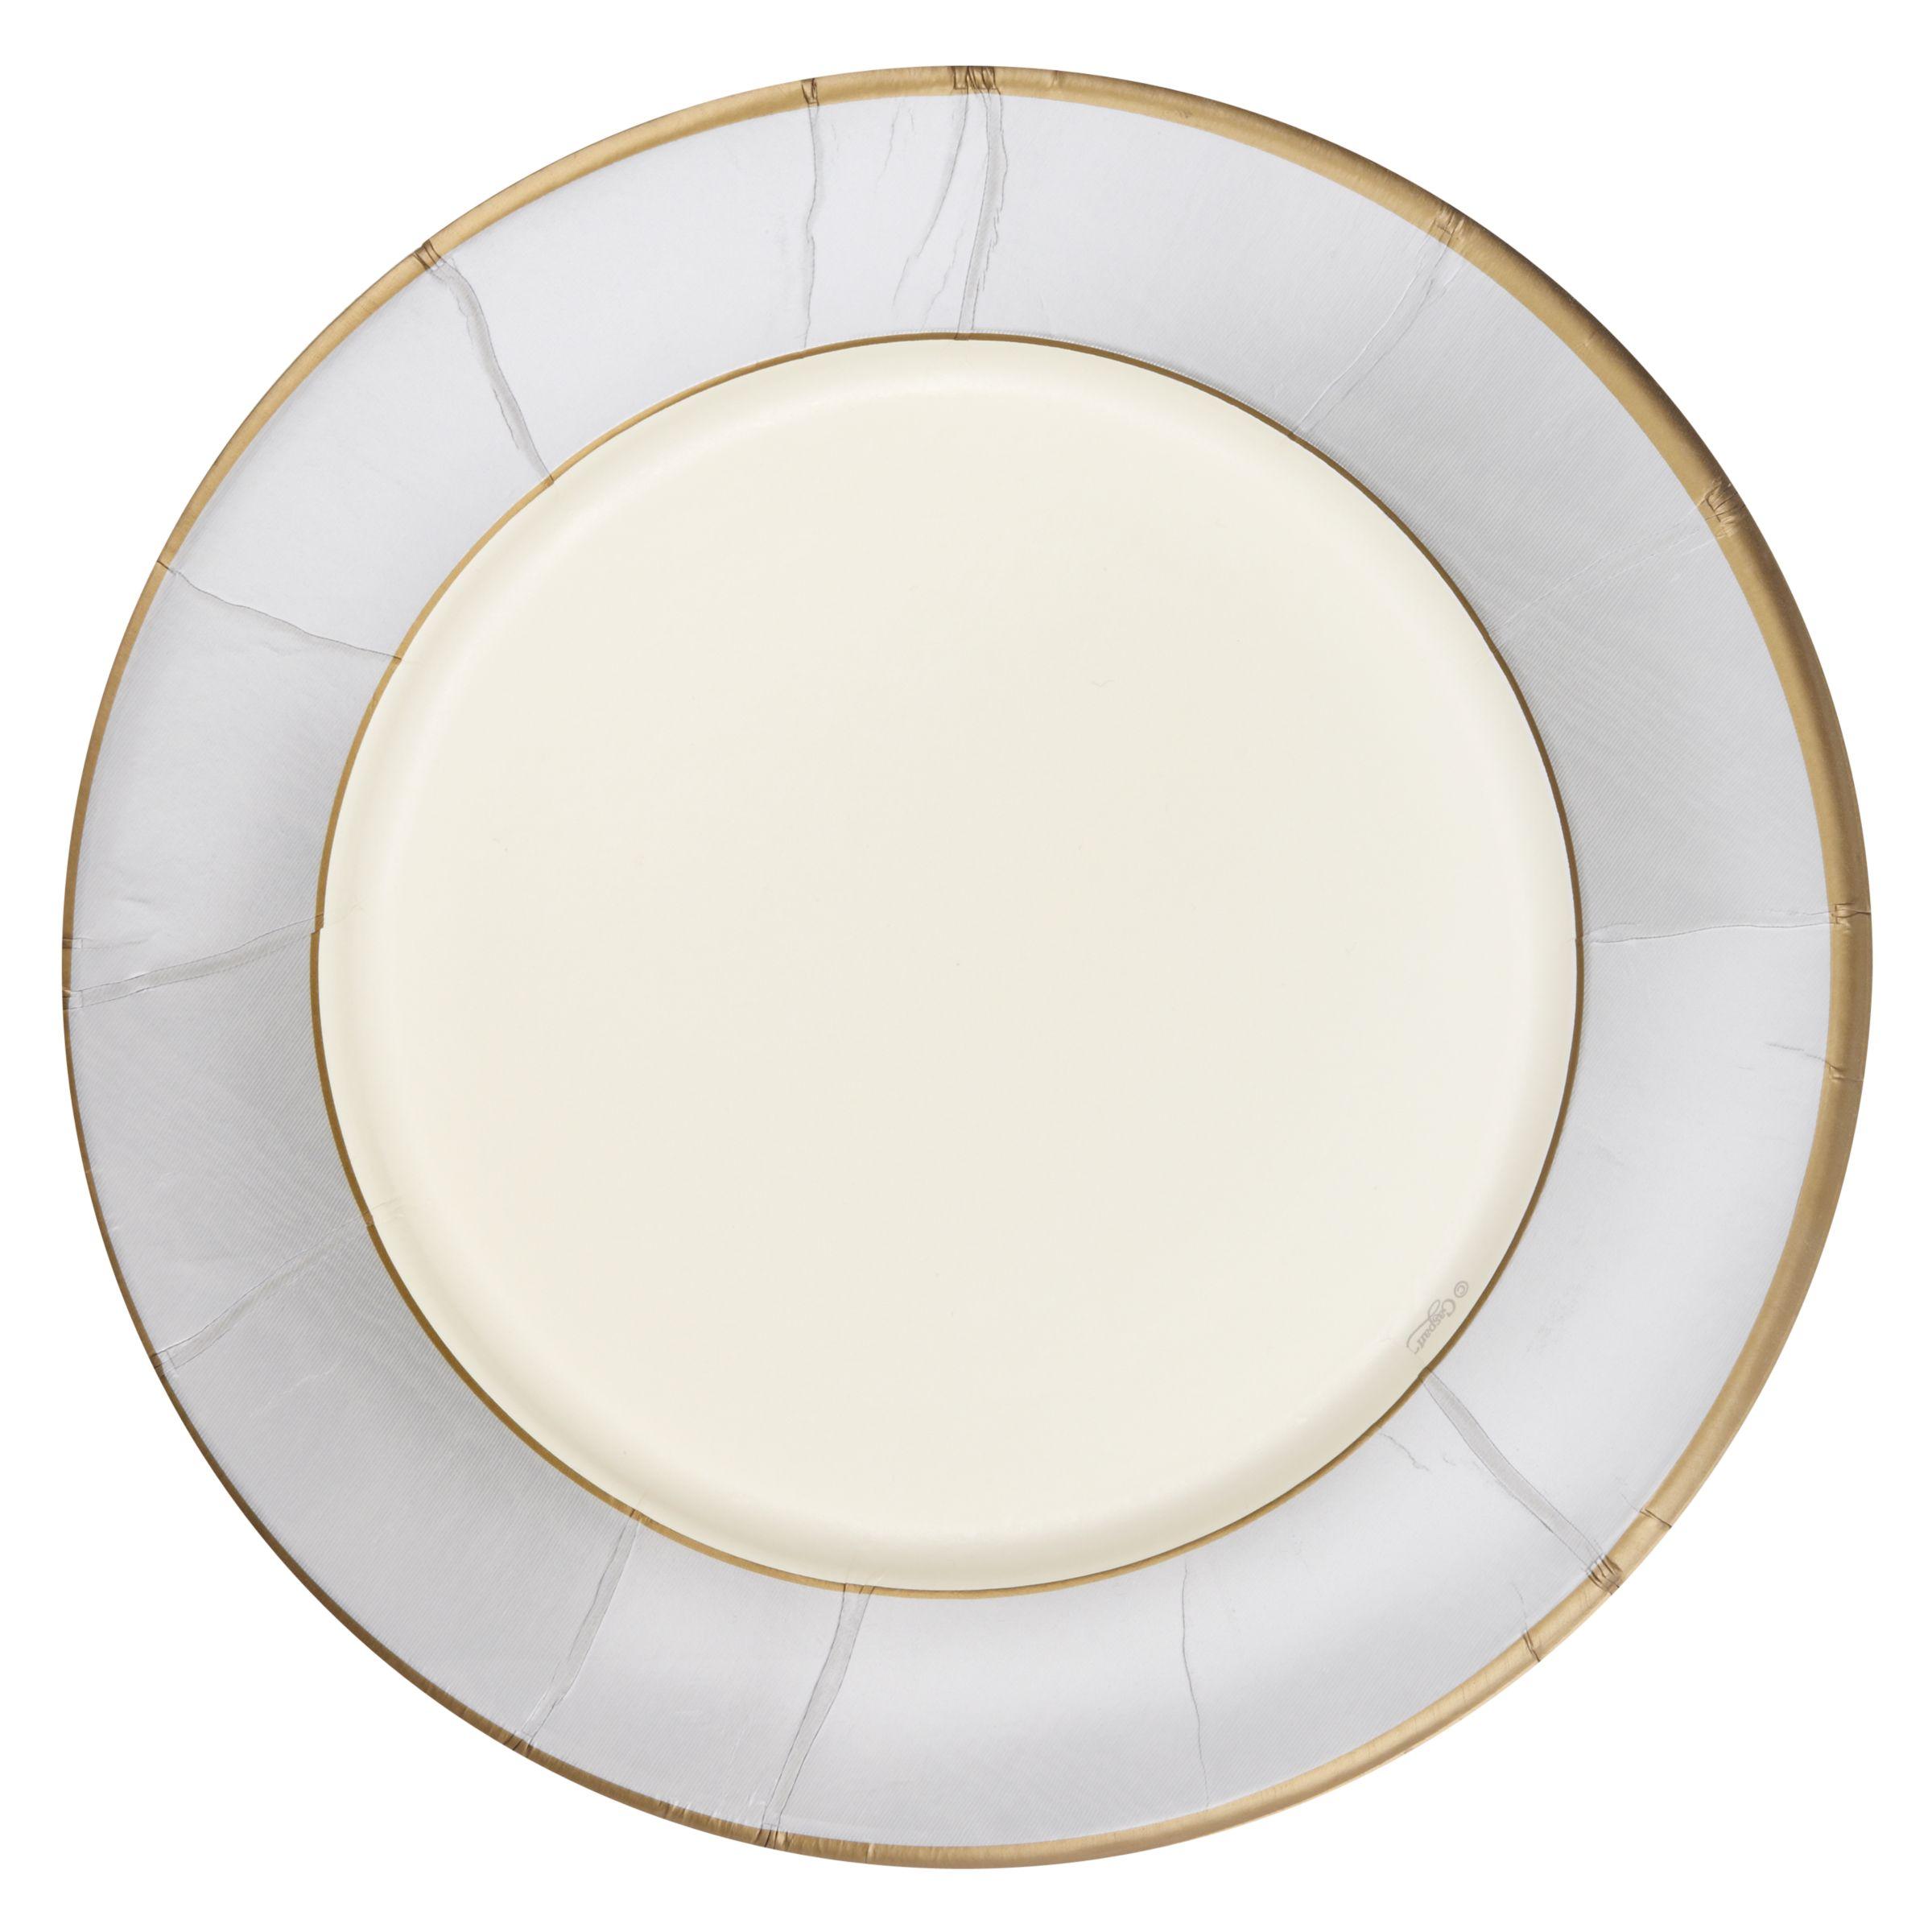 Caspari Paper Plates, Pack of 8, Silver Moire